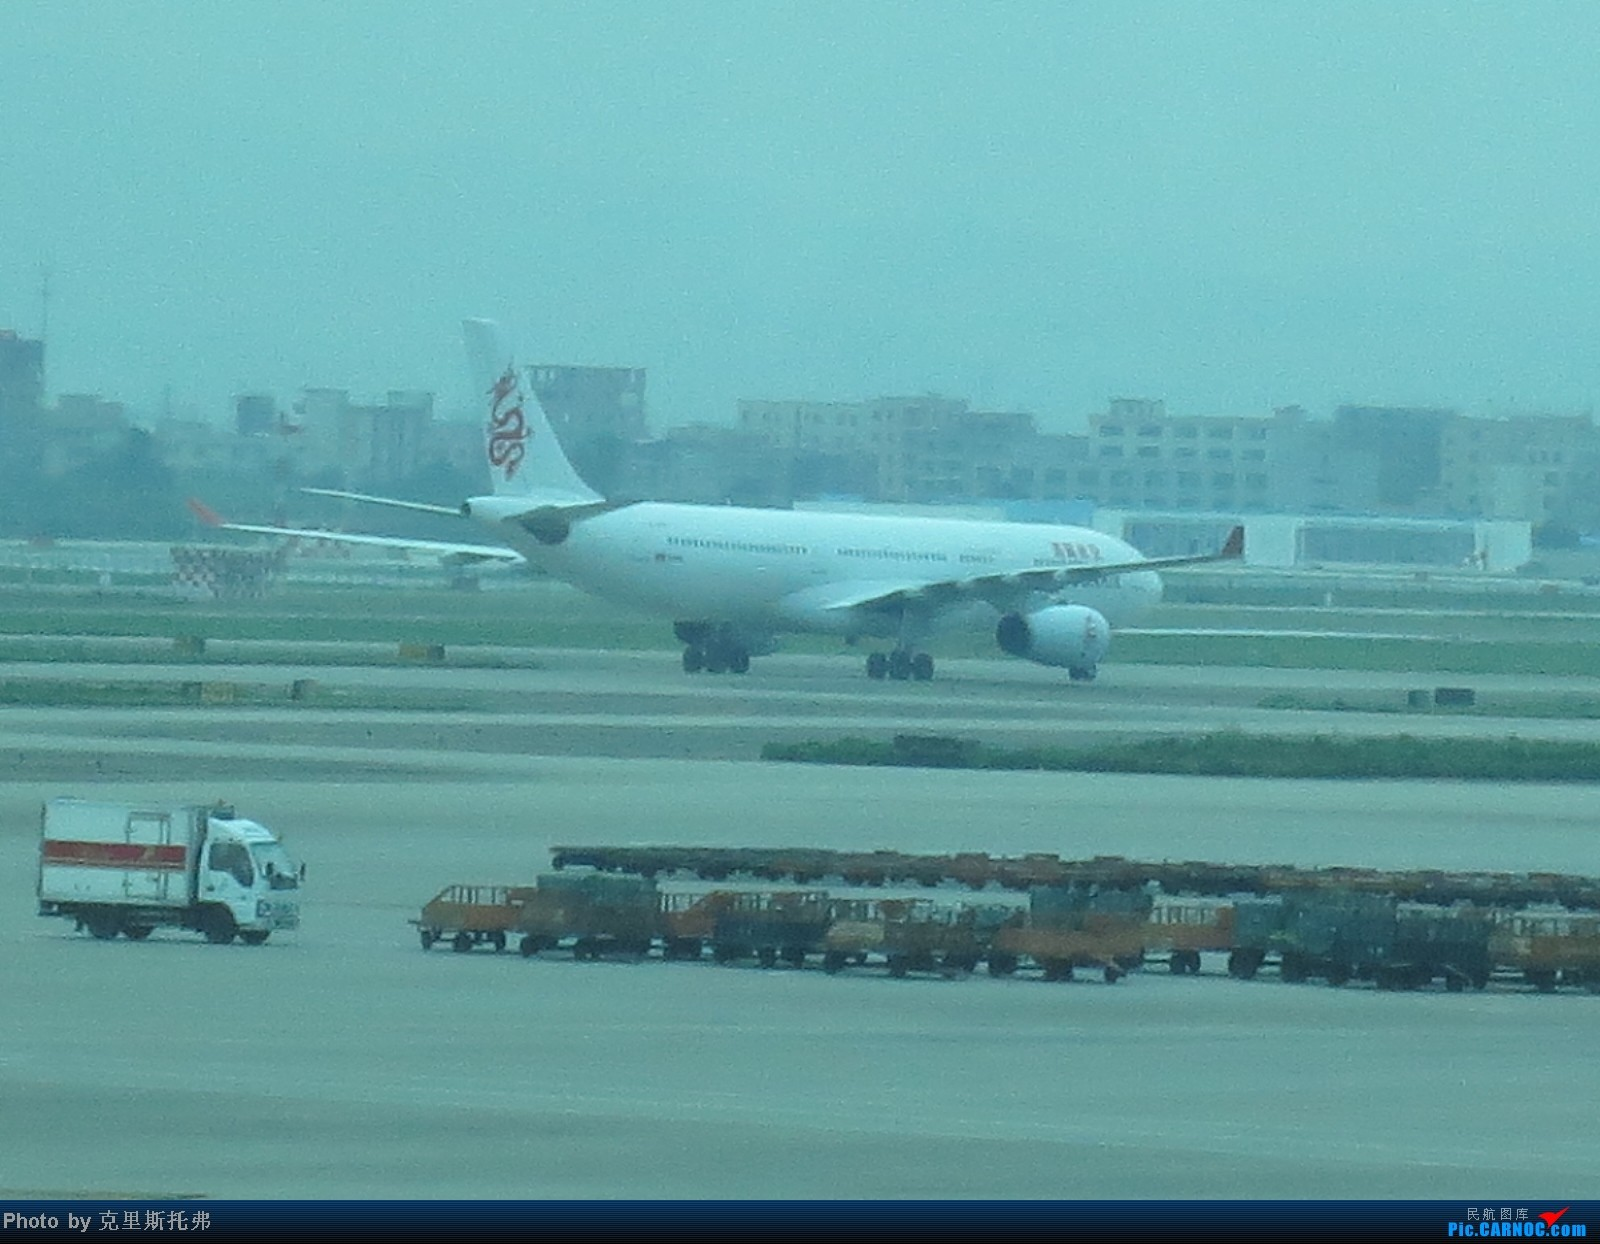 Re:[原创]【广州,你好!】八月齐鲁行 第一集 {初到齐鲁城} 不期而遇,鹏程行万里 相伴相惜,享飞行至美 A330